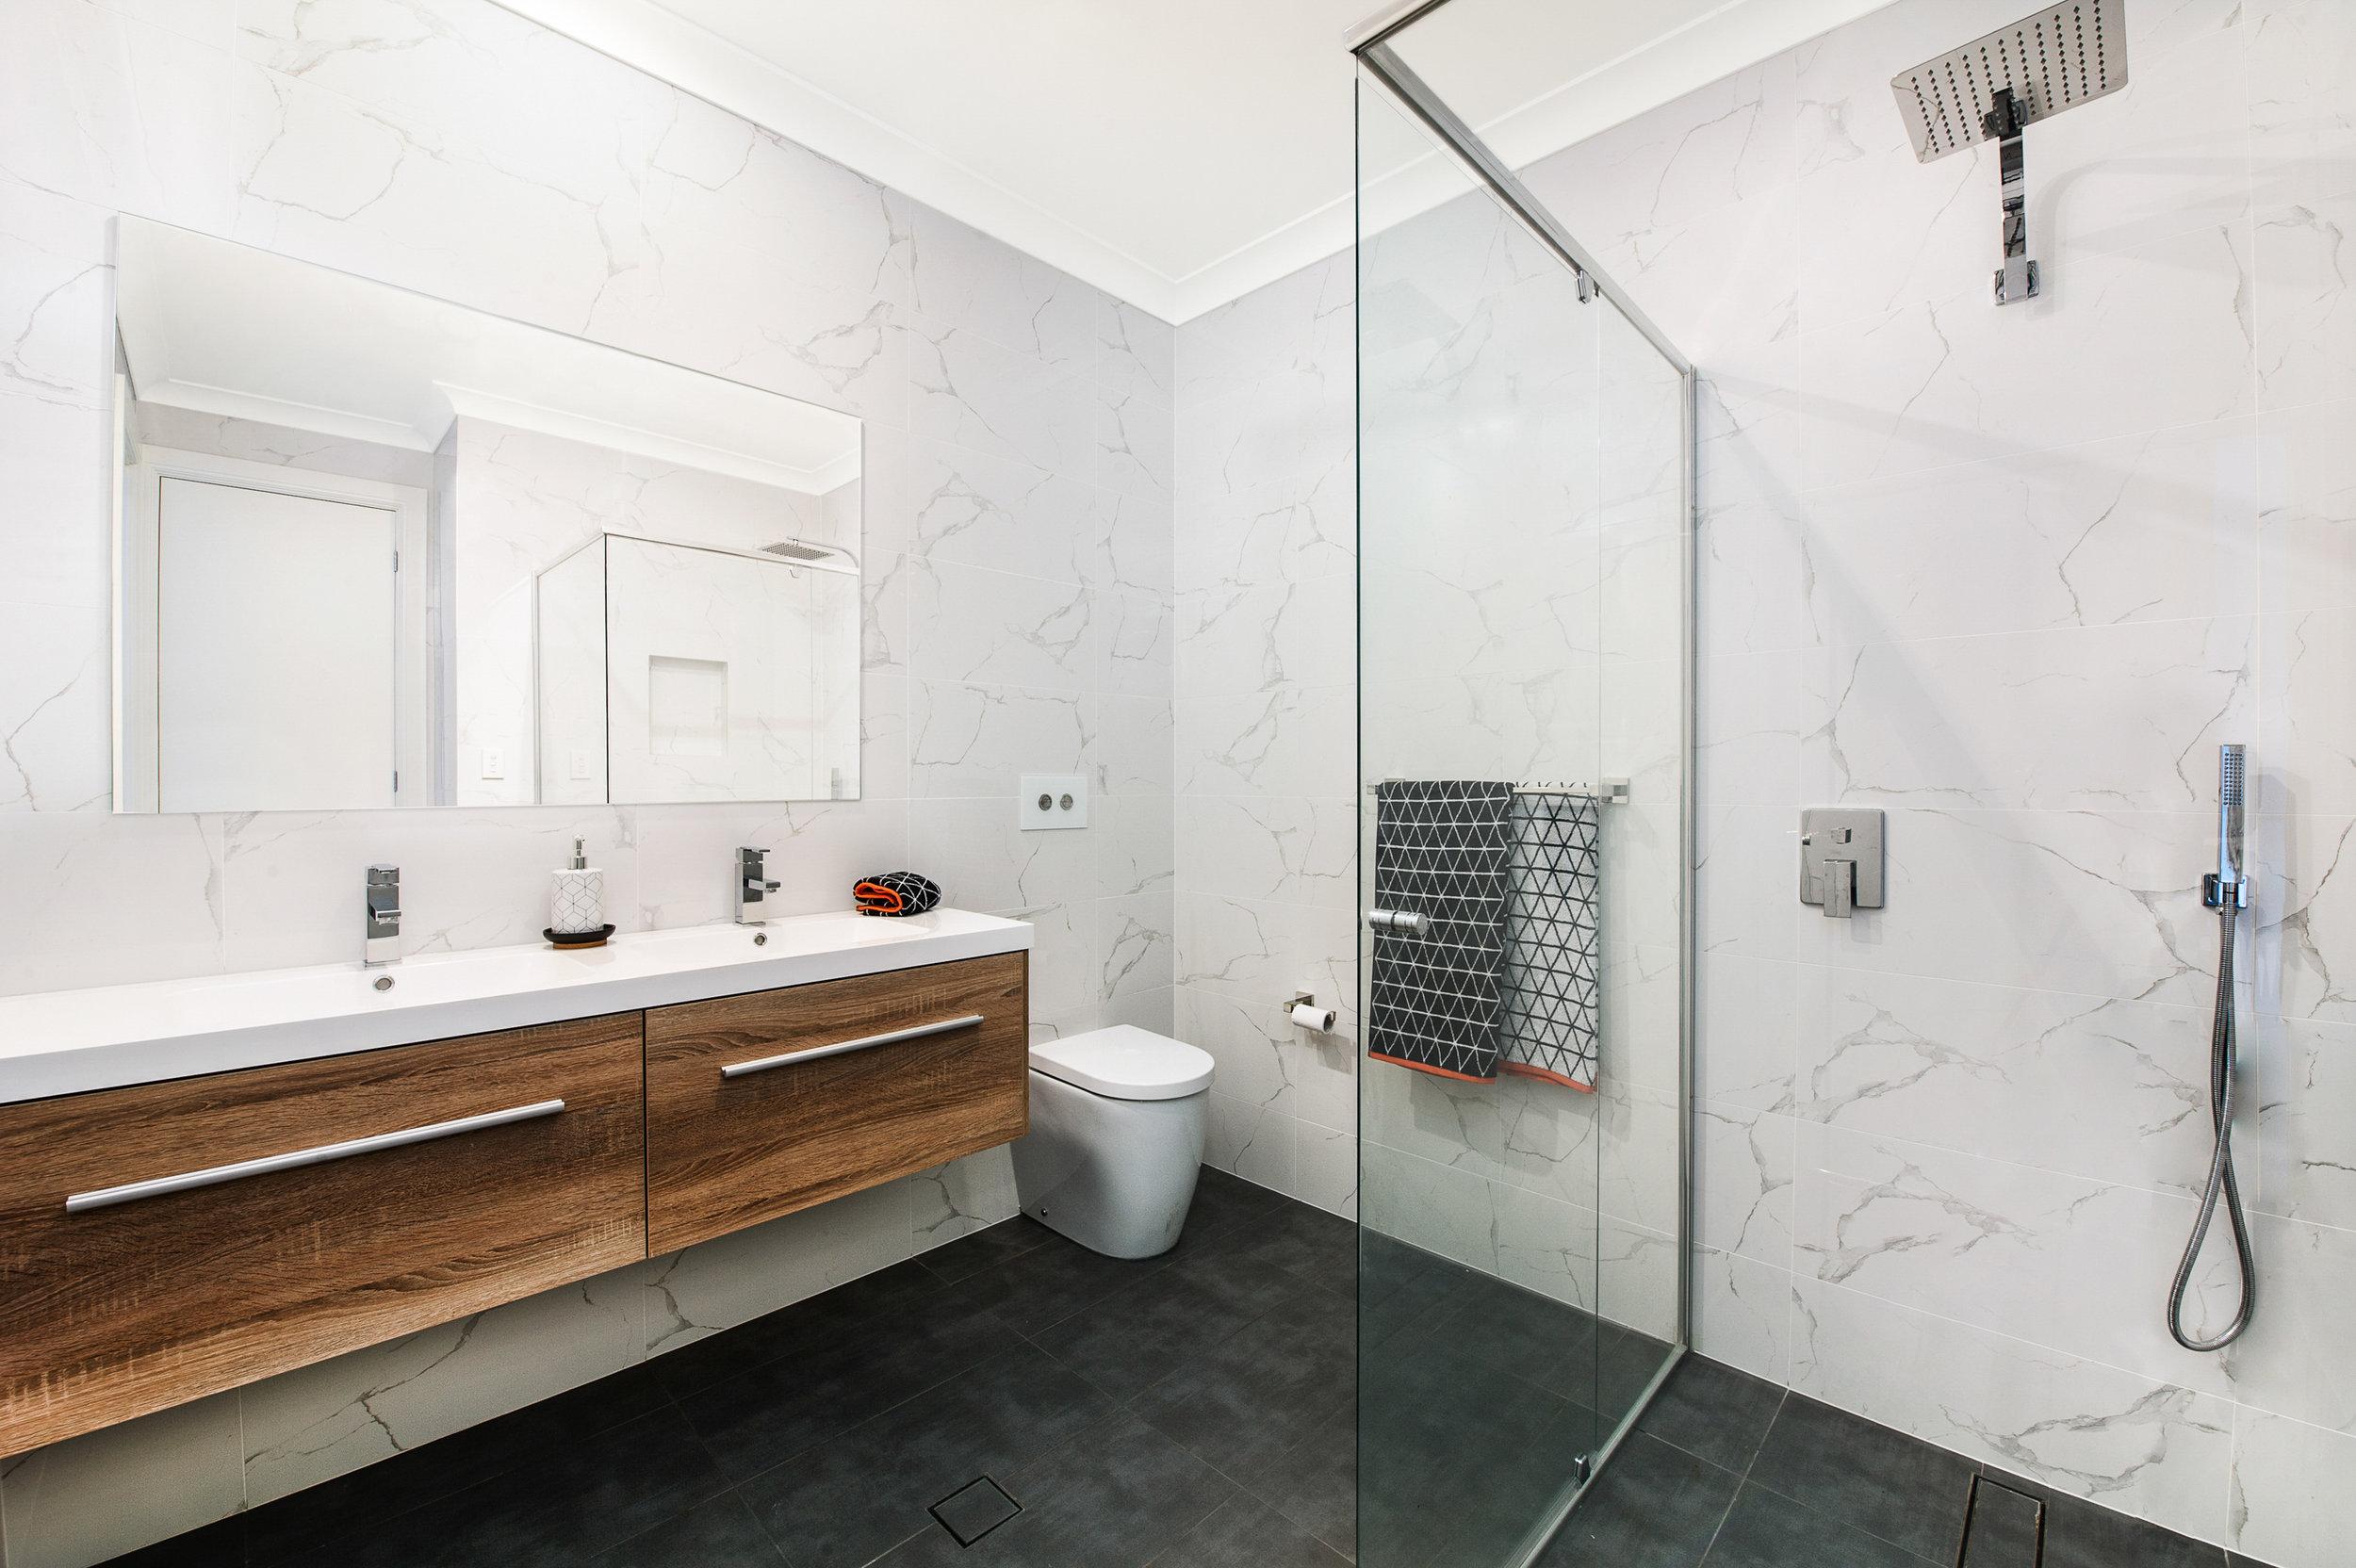 Copy of Kiama Shellharbour Gerringong Berry Wollongong South Coast Illawarra Real Estate Photographer, real estate photography, real estate, photographer - bathroom